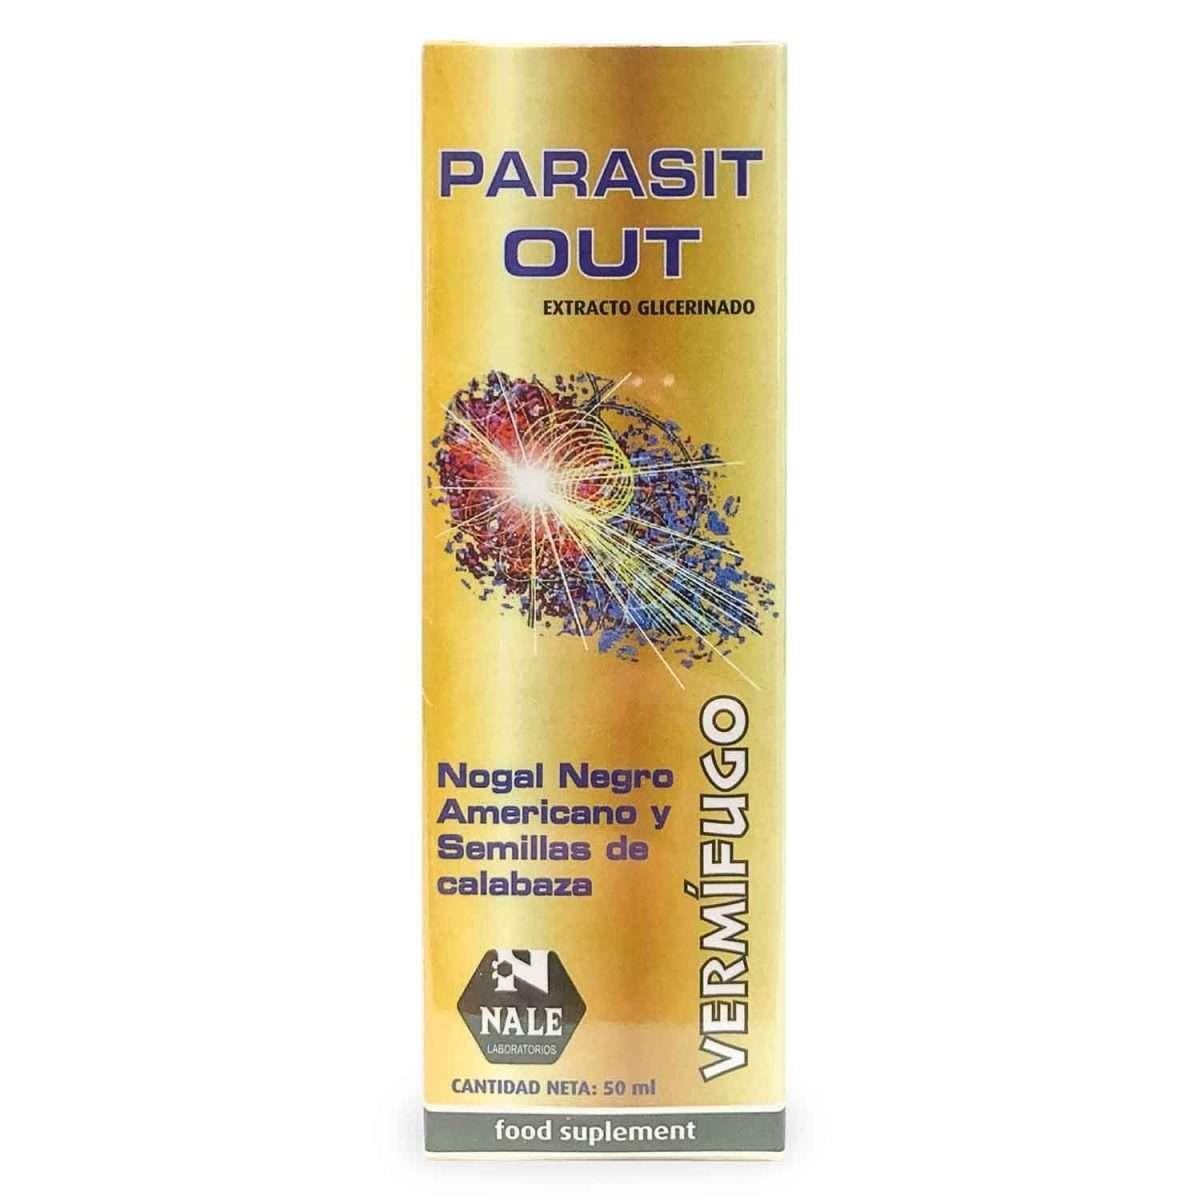 Parasit Out Nale 50 ml